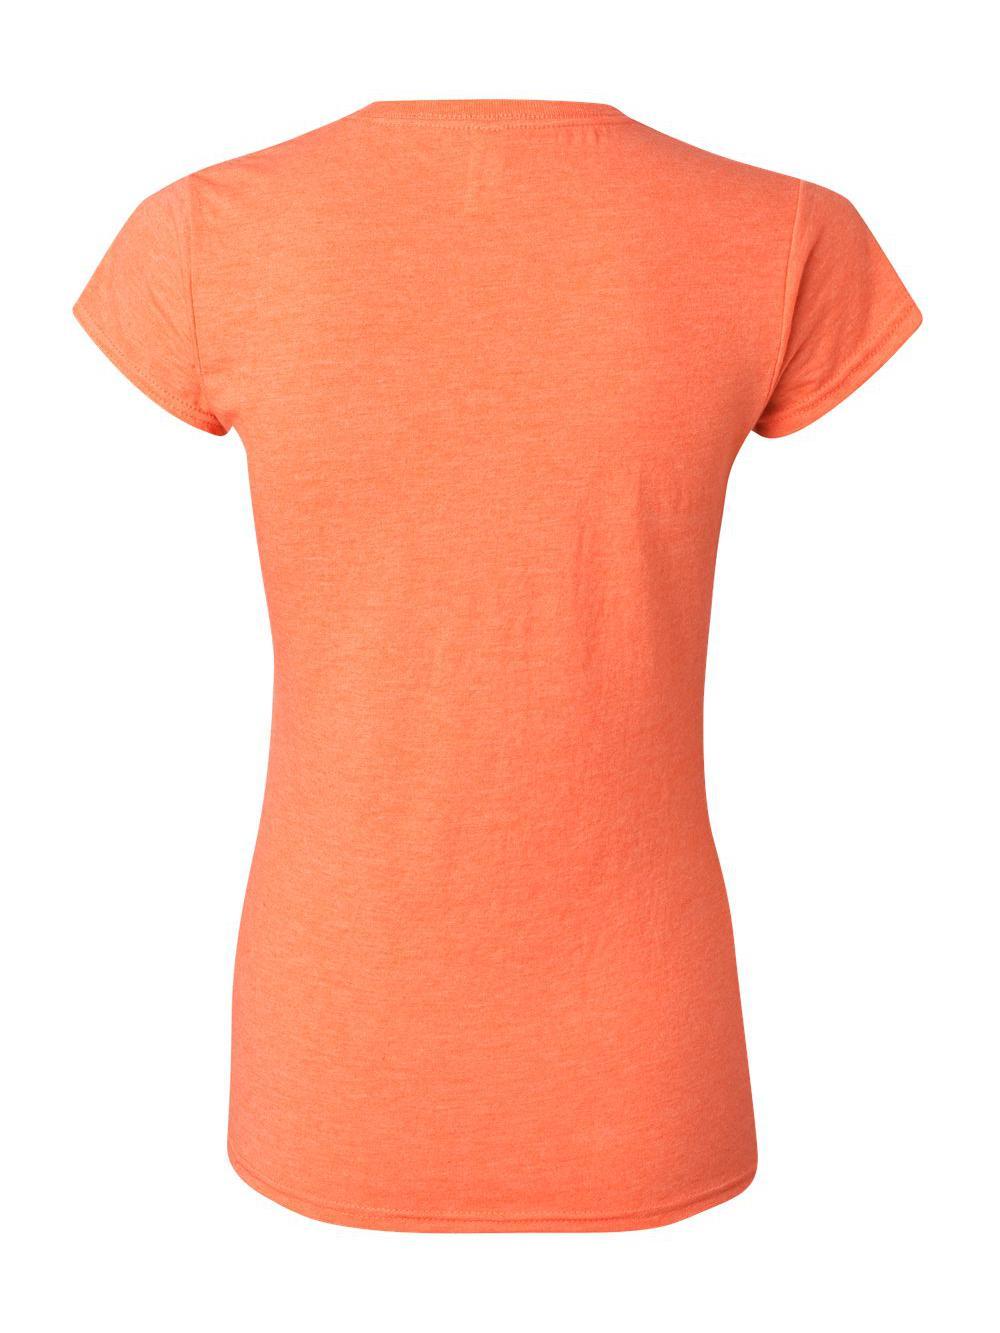 Gildan-Softstyle-Women-039-s-T-Shirt-64000L thumbnail 22